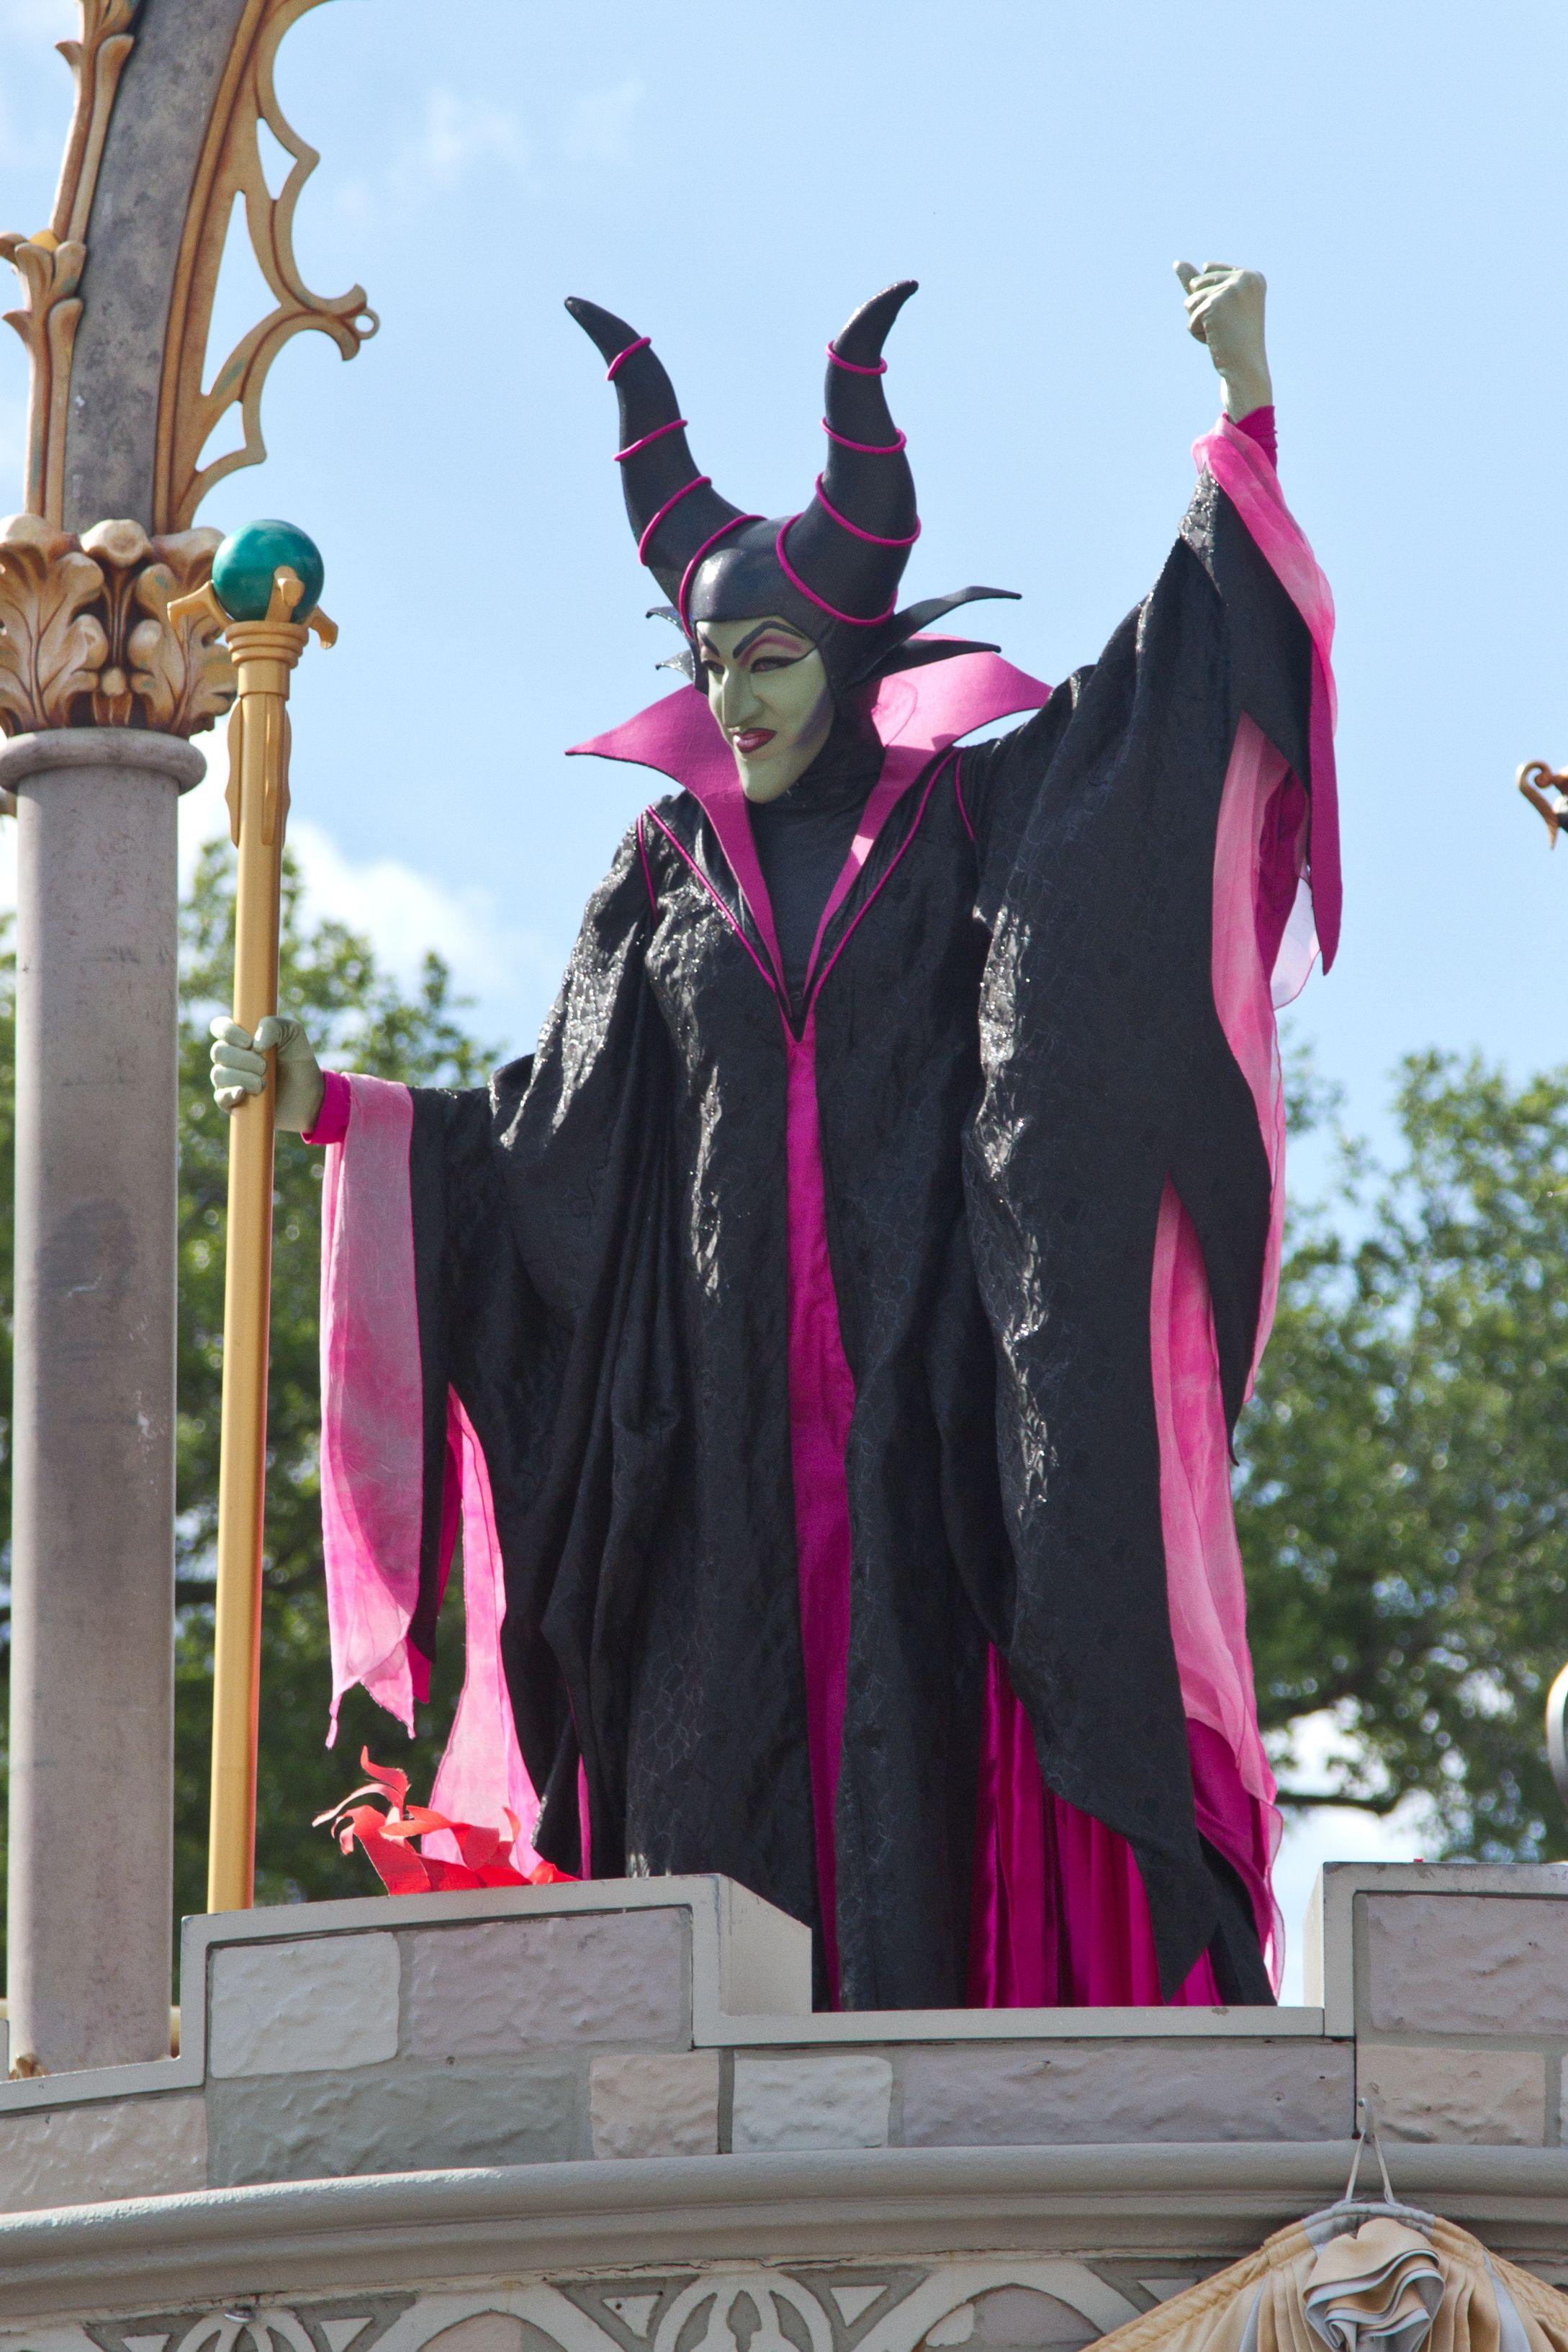 Dream along with mickey magic kingdom walt disney world dream along with mickey magic kingdom walt disney world maleficent m4hsunfo